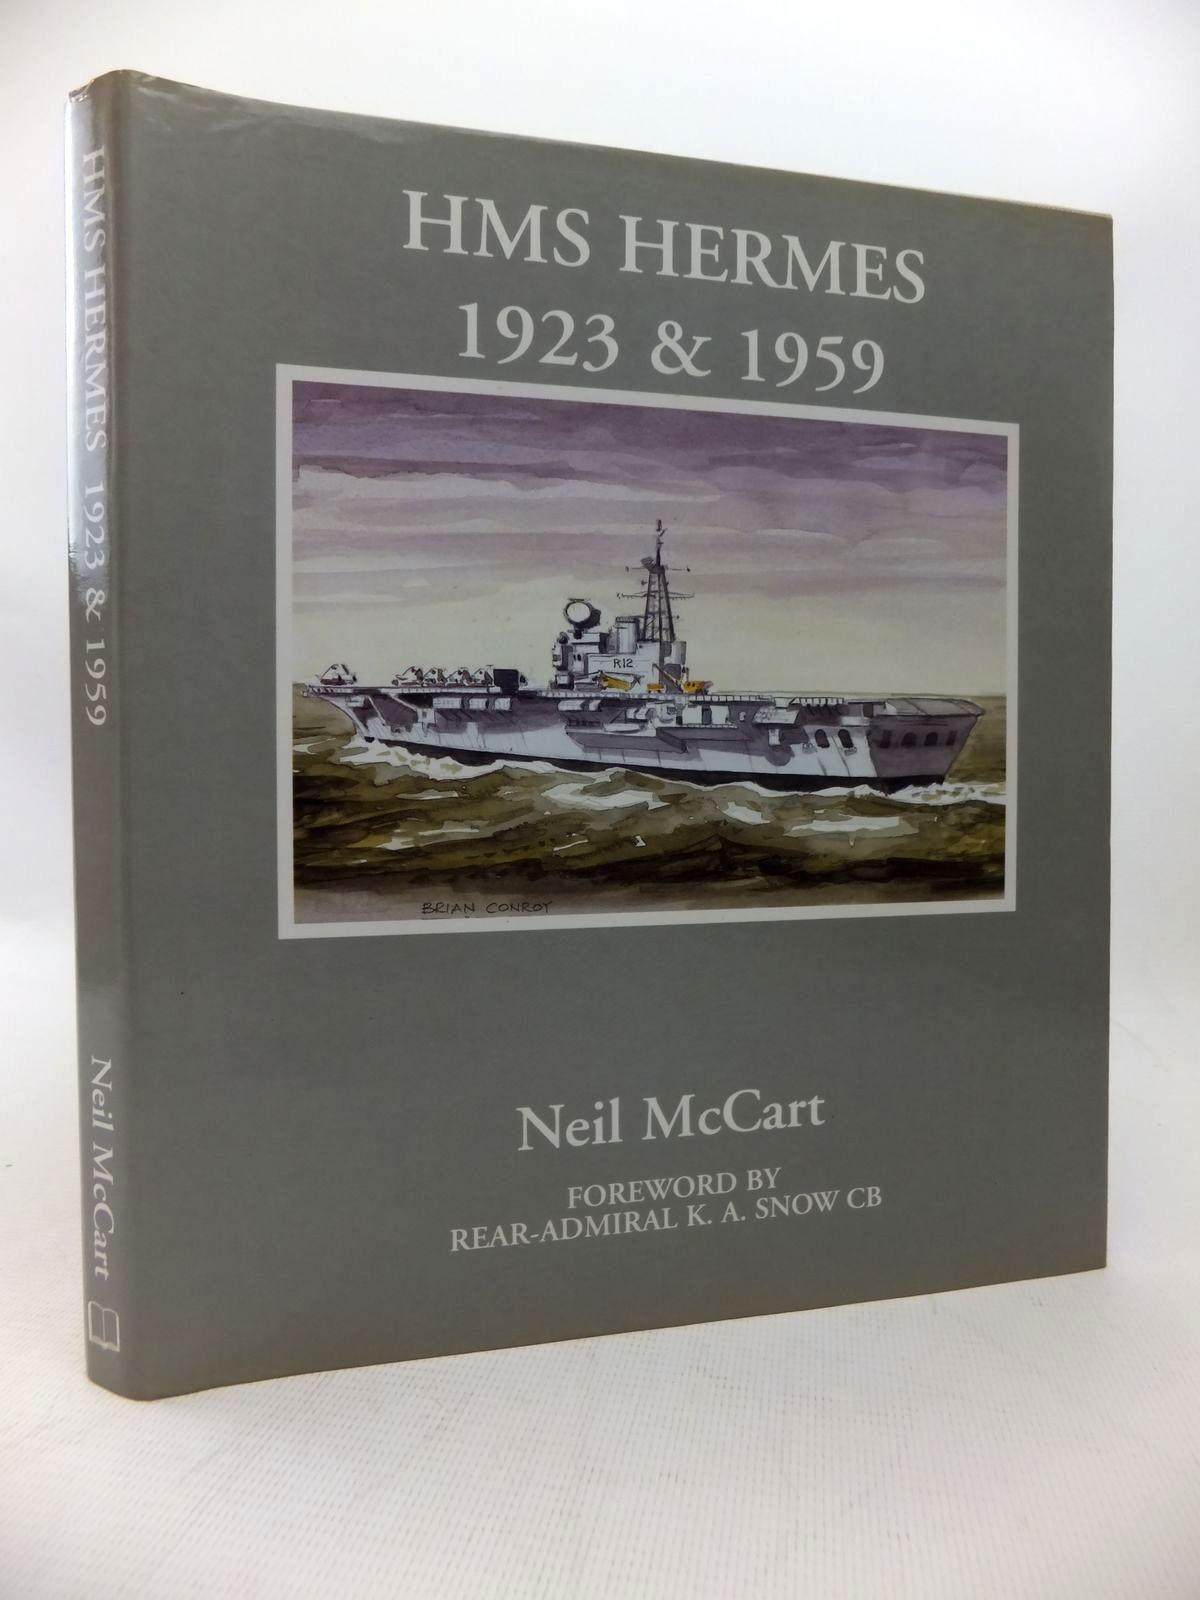 HMS HERMES 1923 & 1959 written by McCart, Neil, STOCK CODE